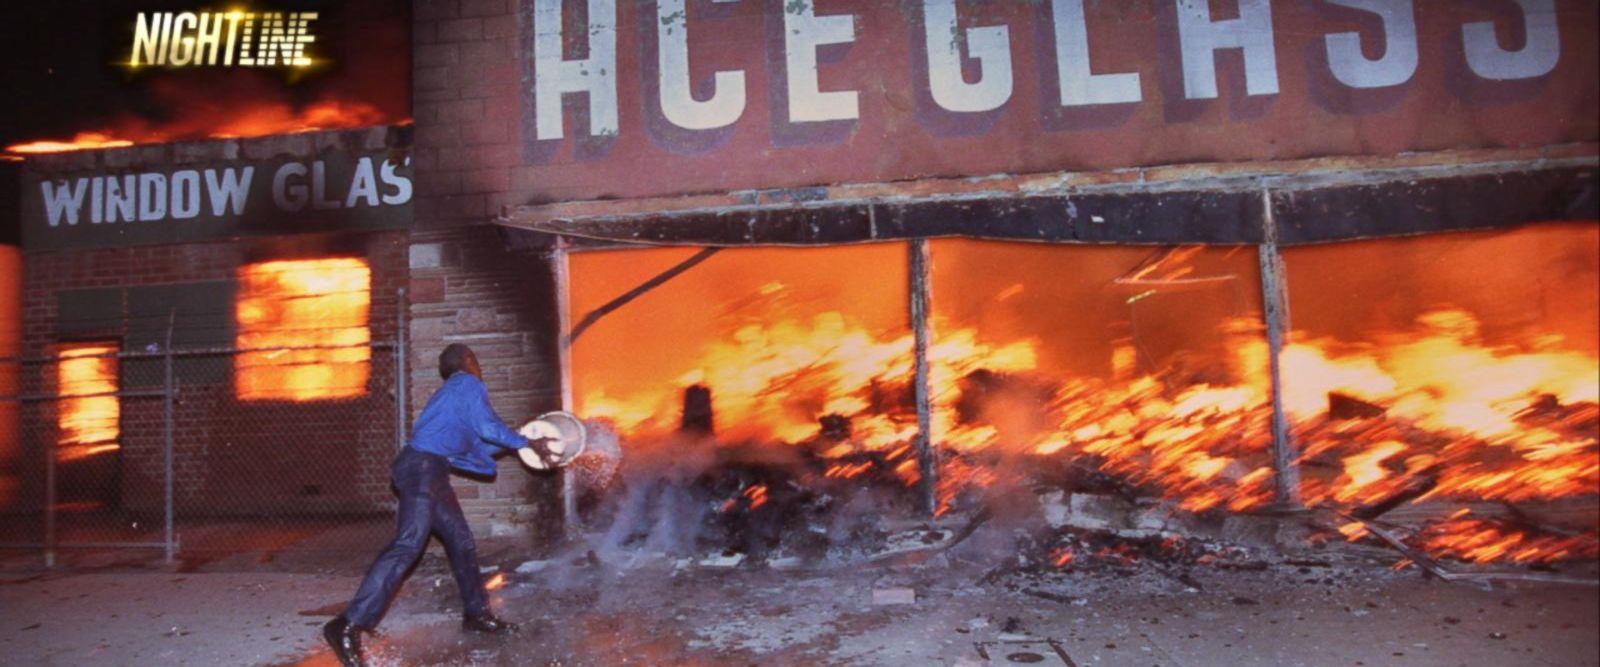 VIDEO: Korean-American photojournalist describes living through L.A. riots: 'It was horrific'